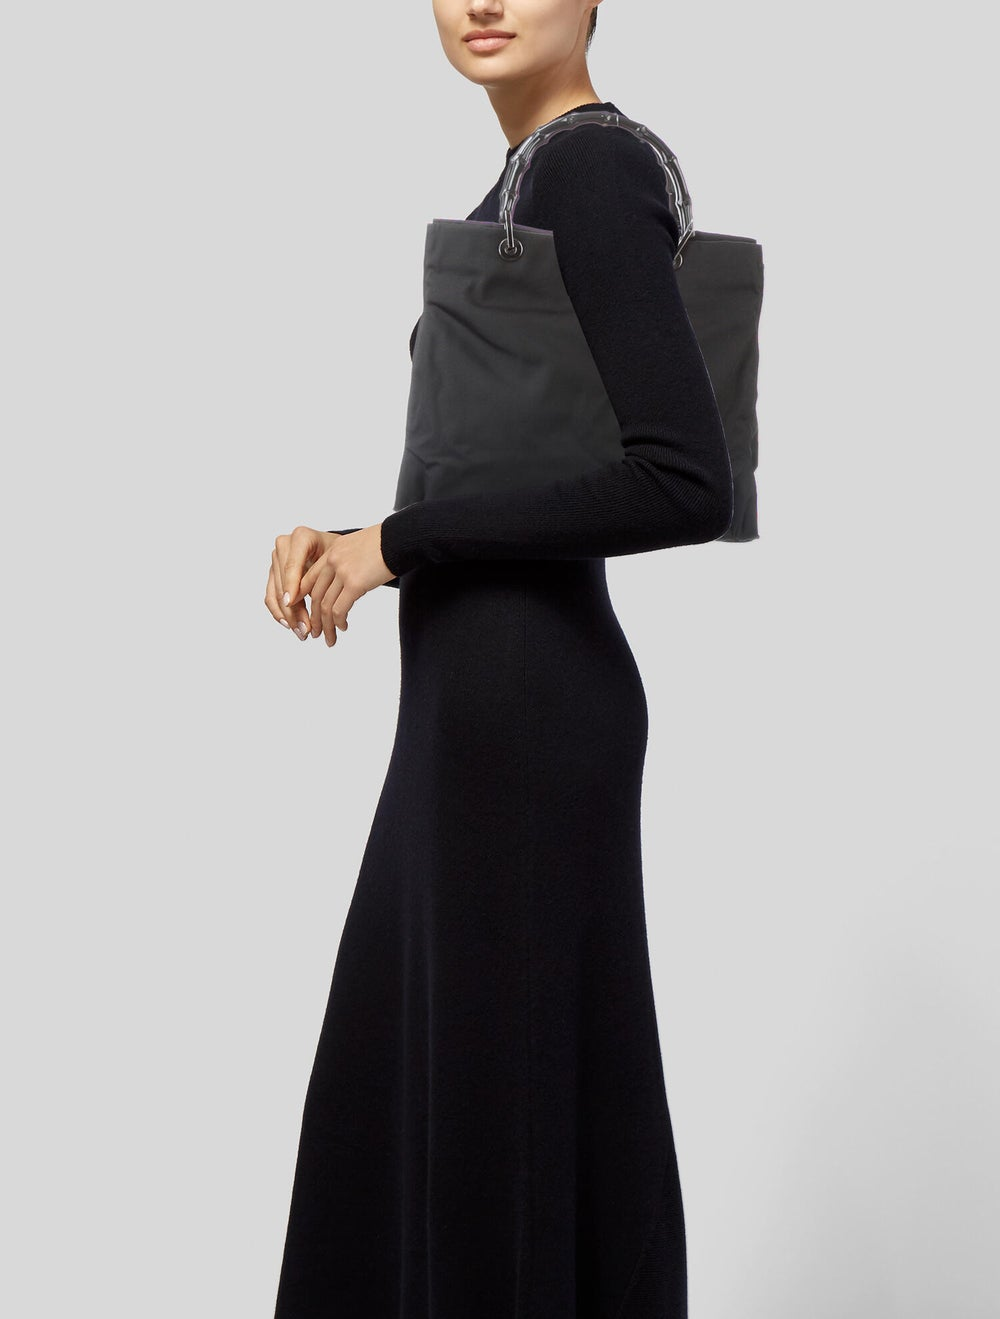 Gucci Vintage Nylon Bamboo Handle Bag Black - image 2